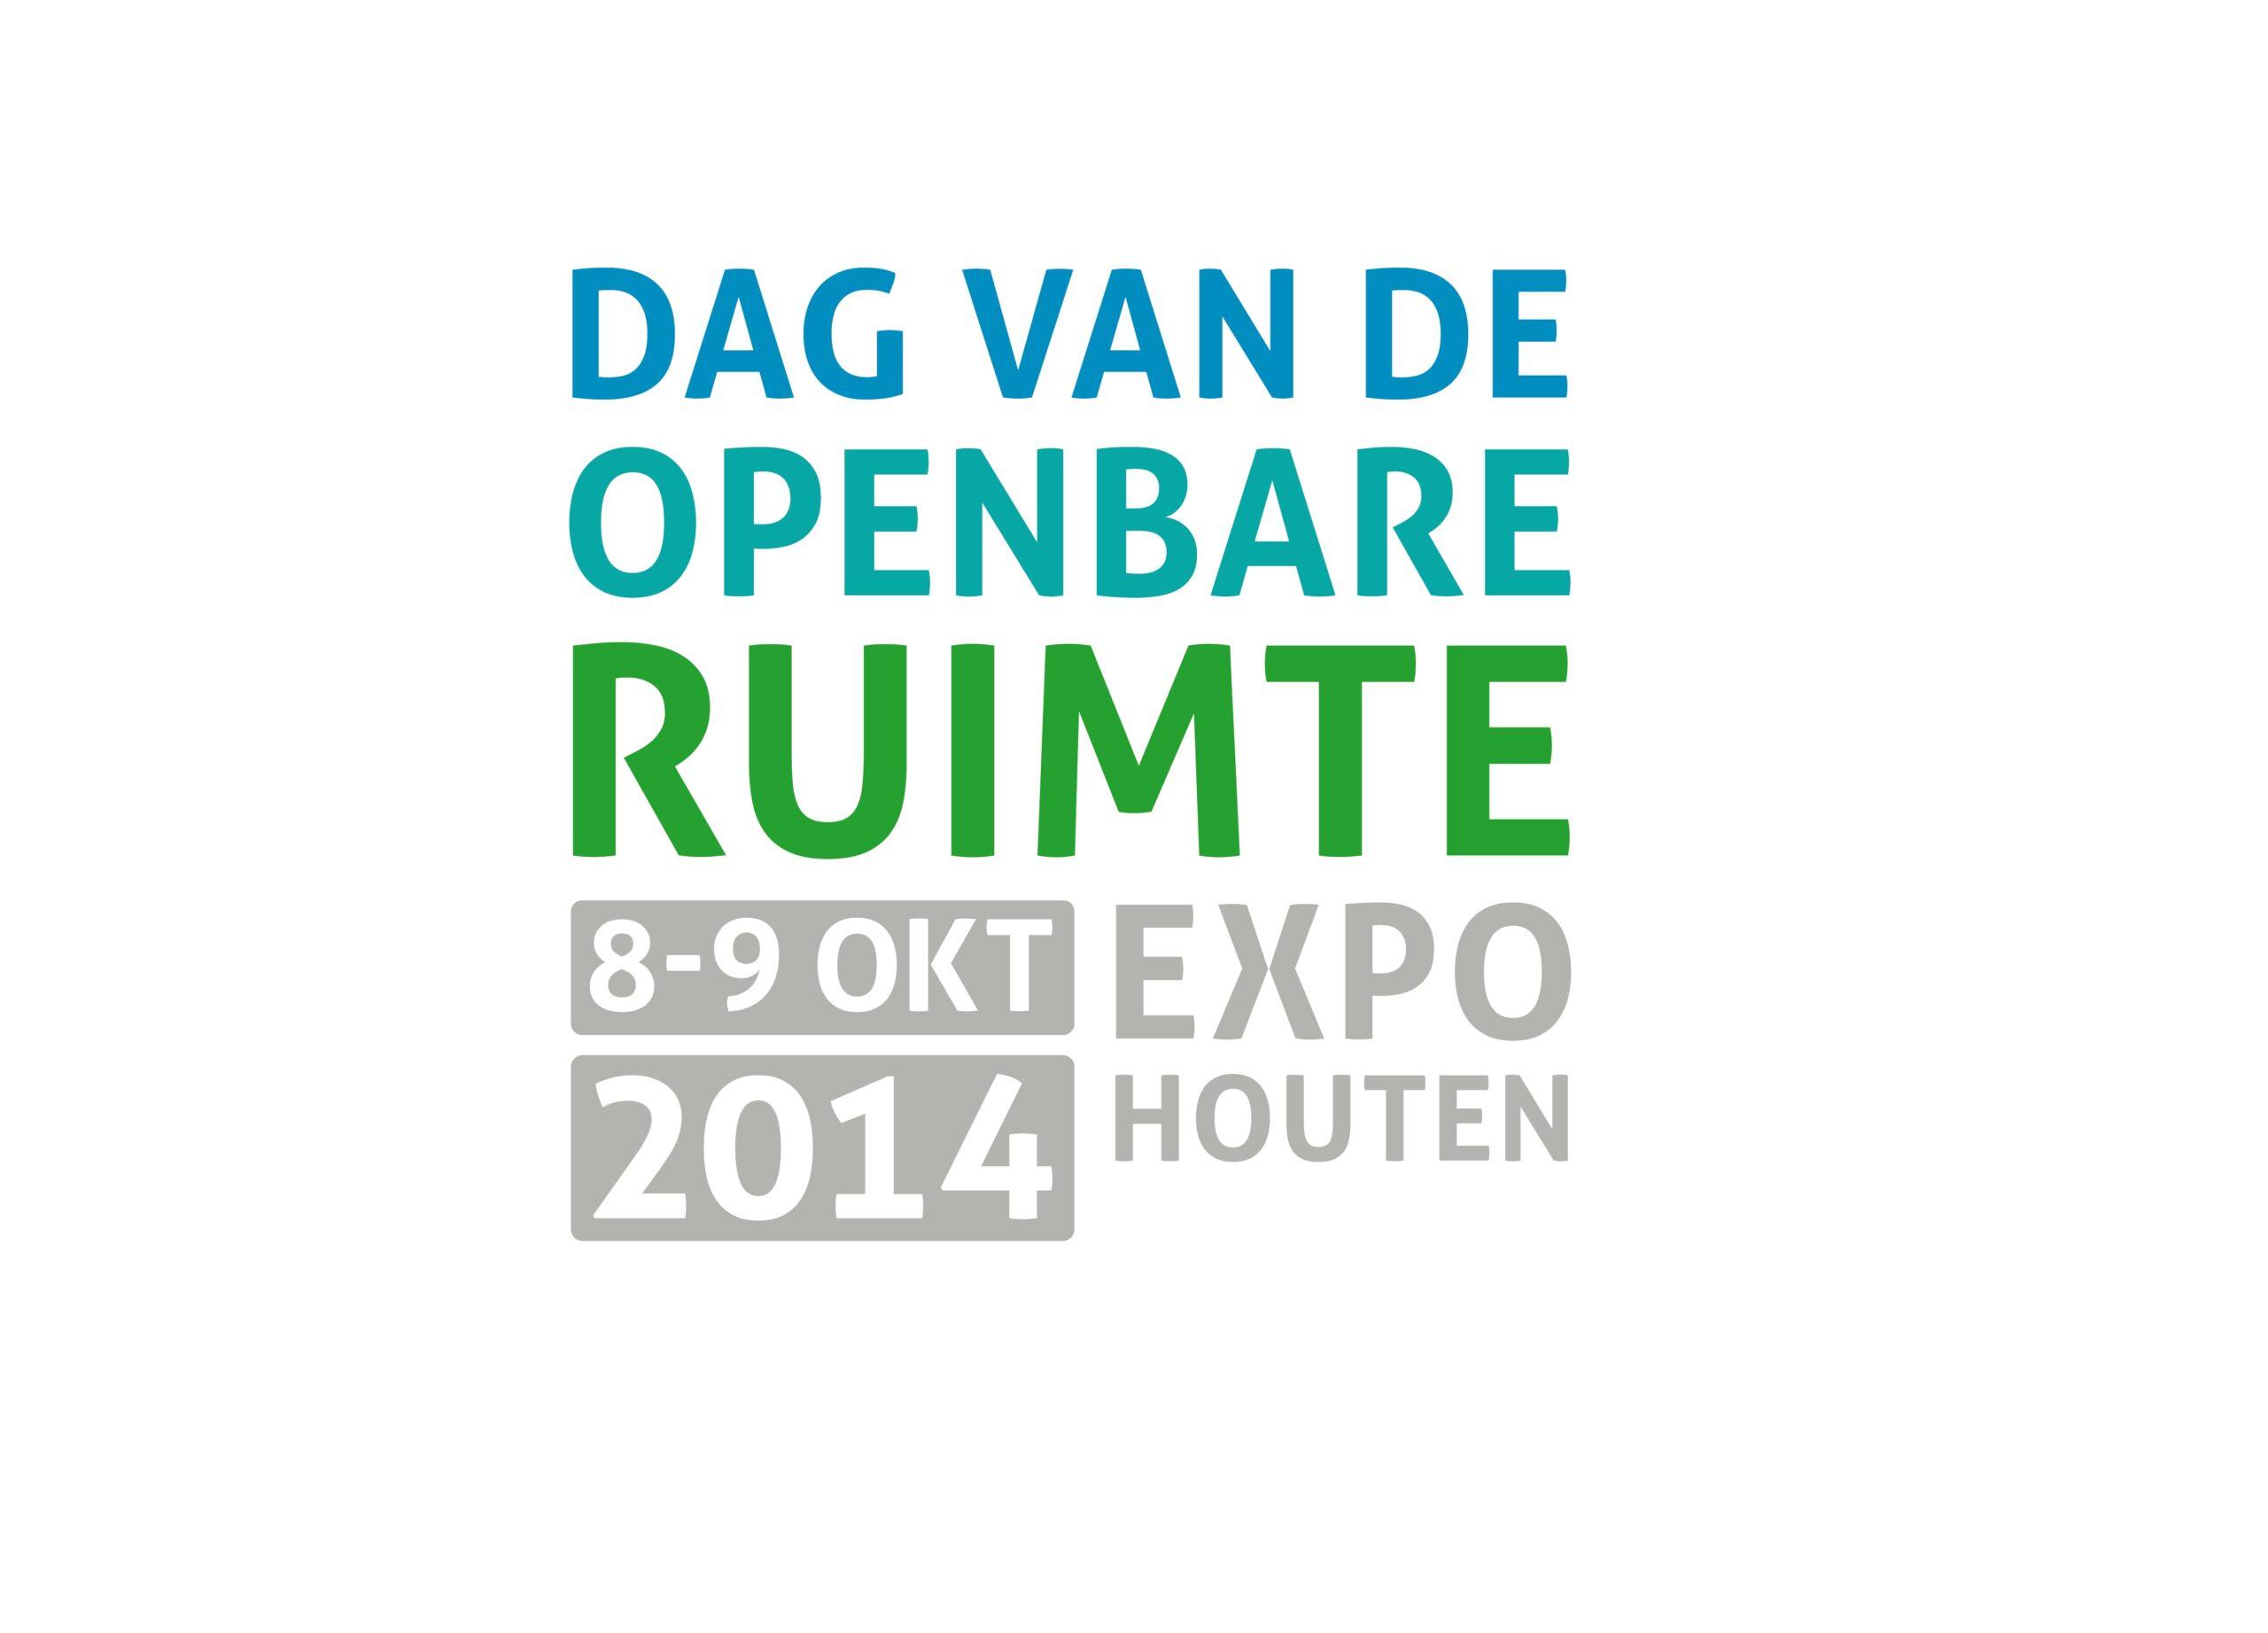 Dag van de Openbare Ruimte logo